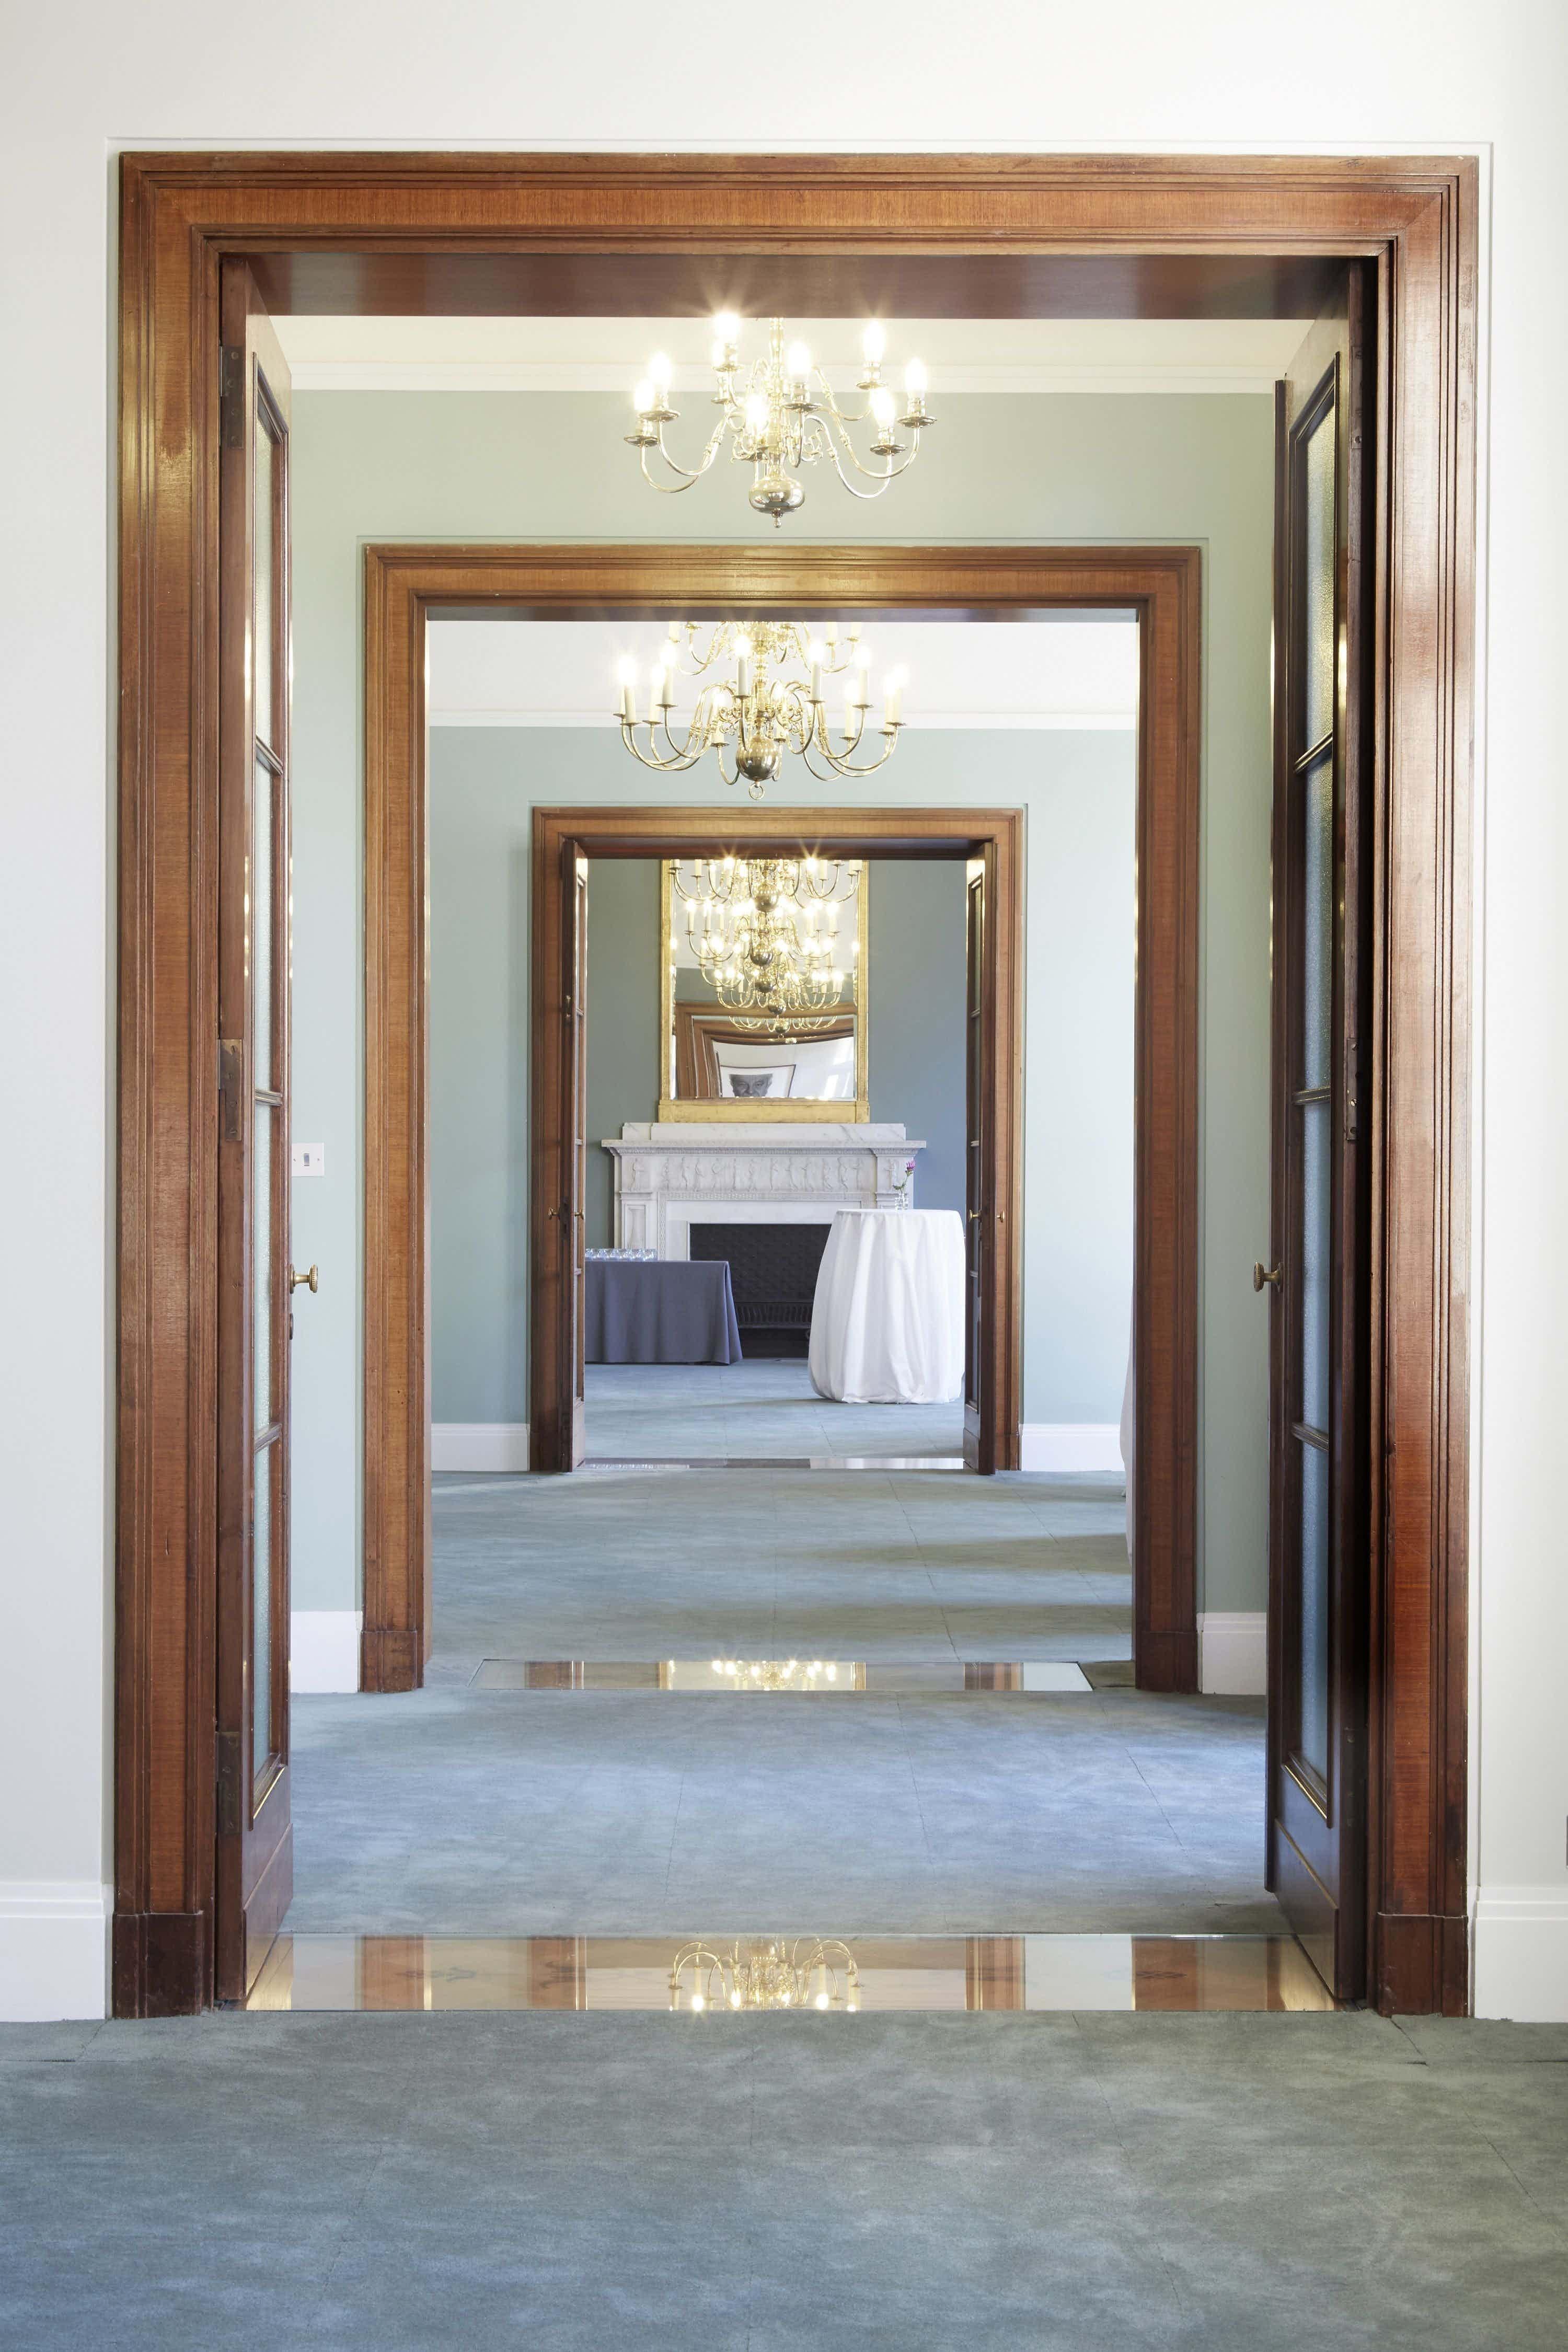 City of London rooms., The Royal Society